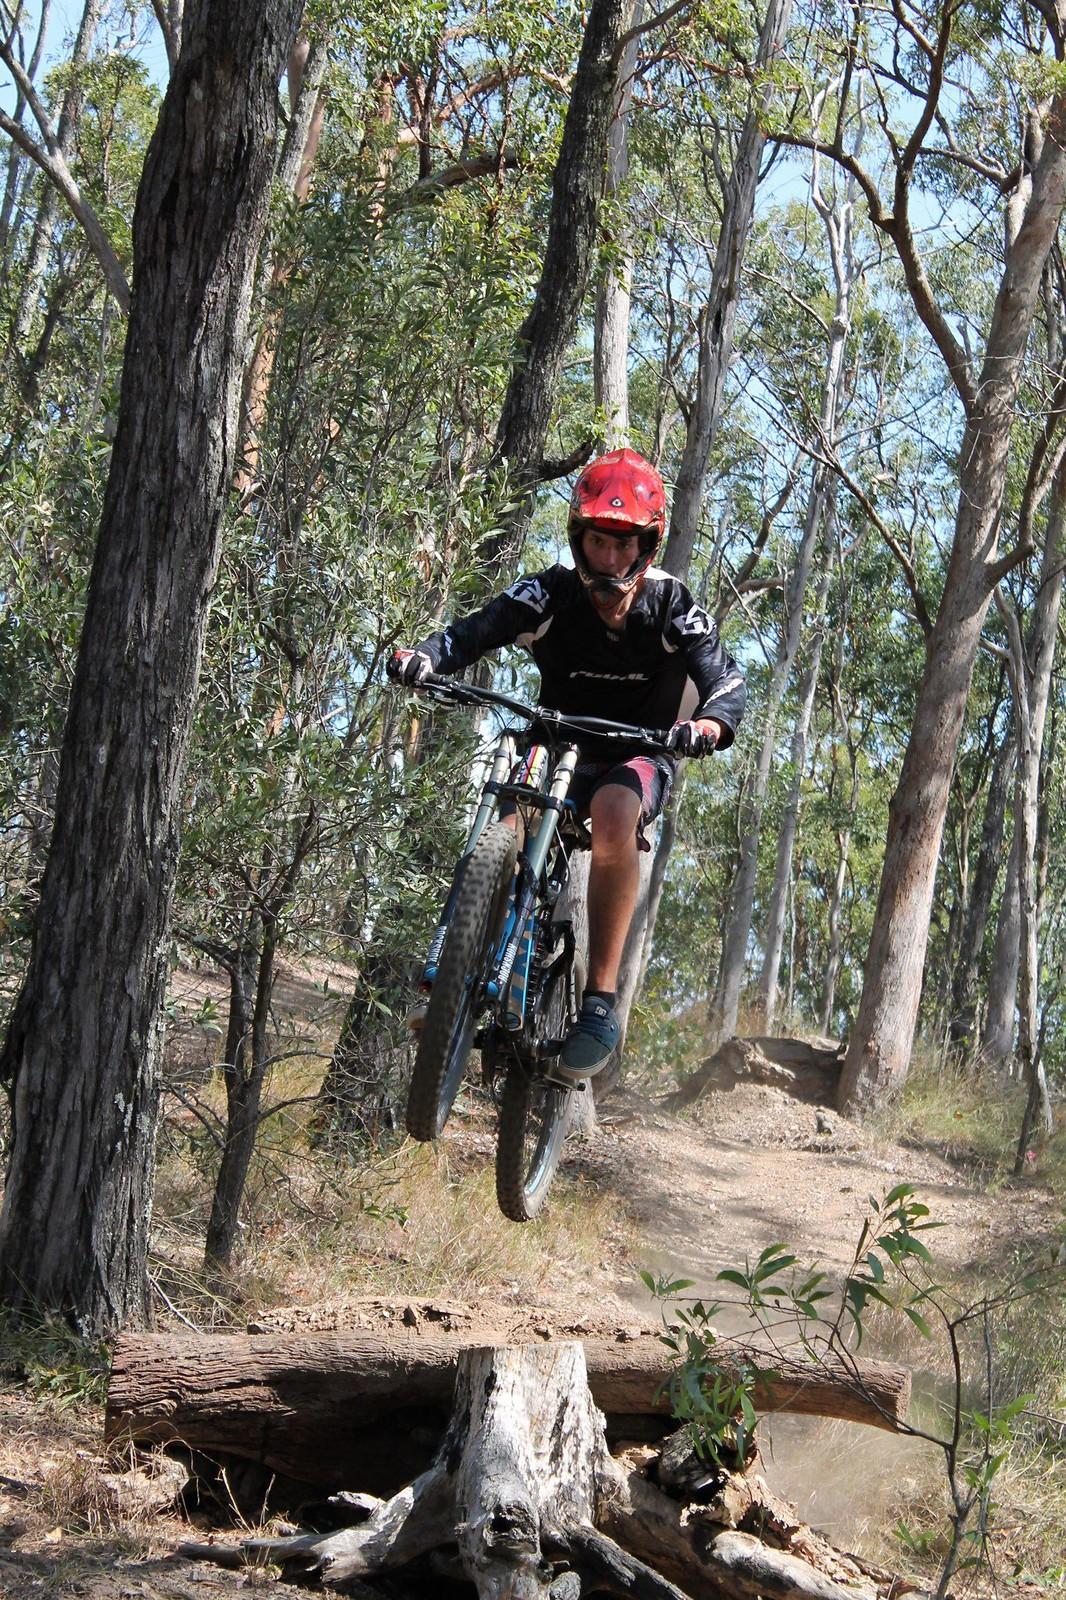 735560 549909825037842 633679800 o - Aja1d0ss - Mountain Biking Pictures - Vital MTB